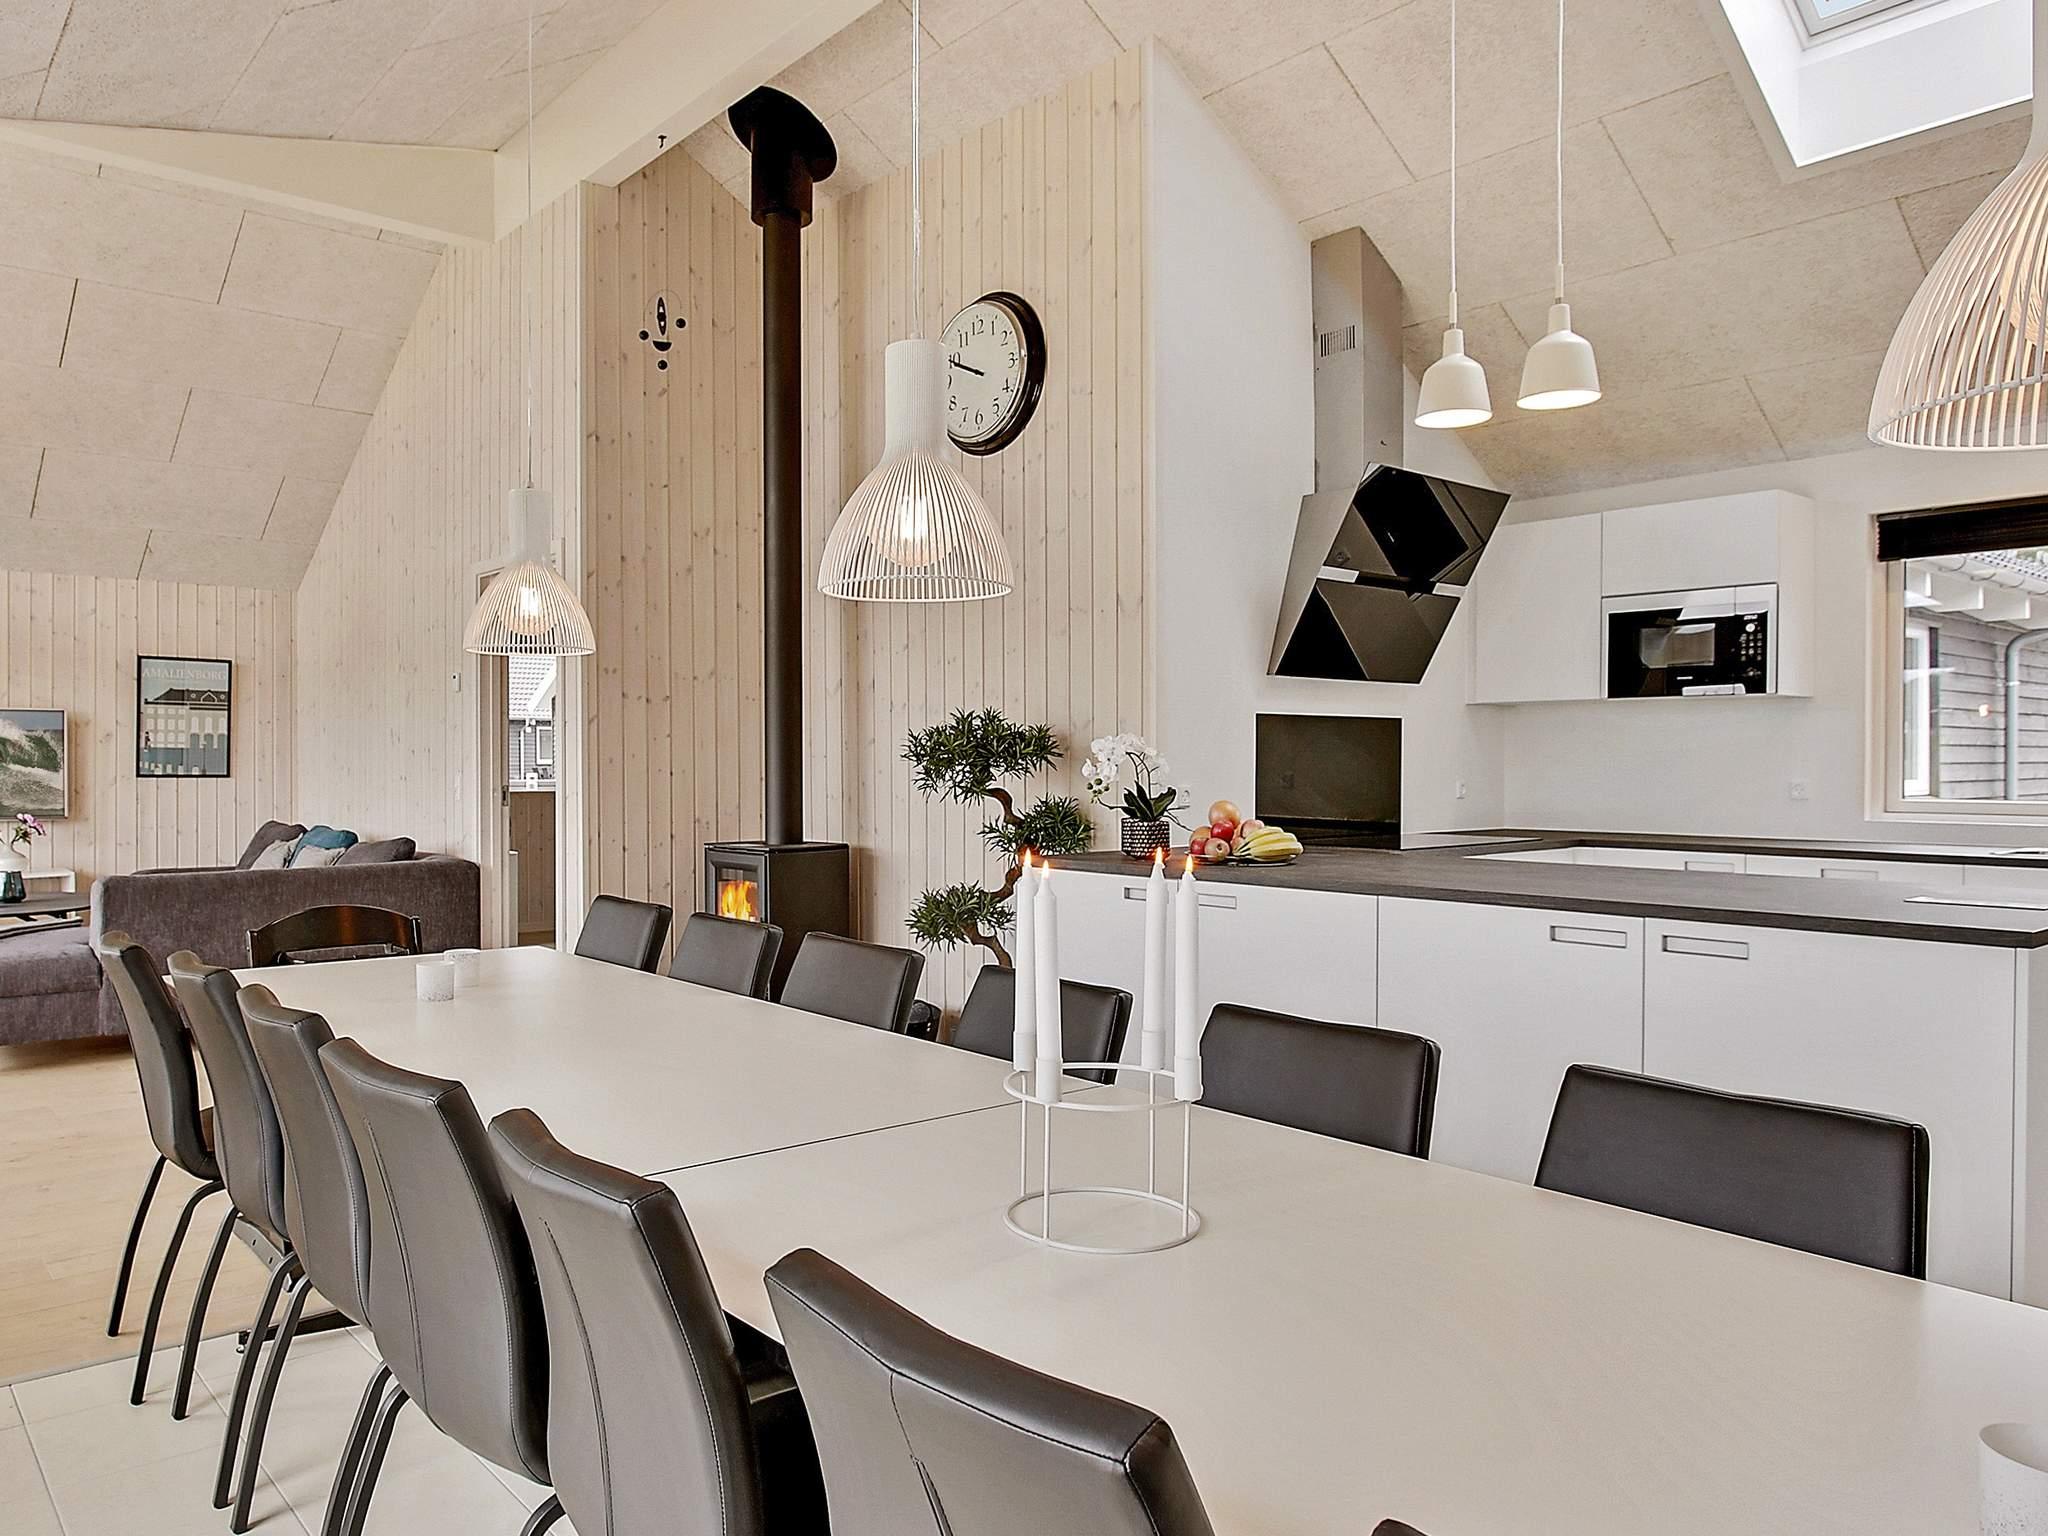 Ferienhaus Vejby Strand (2032832), Vejby, , Nordseeland, Dänemark, Bild 5